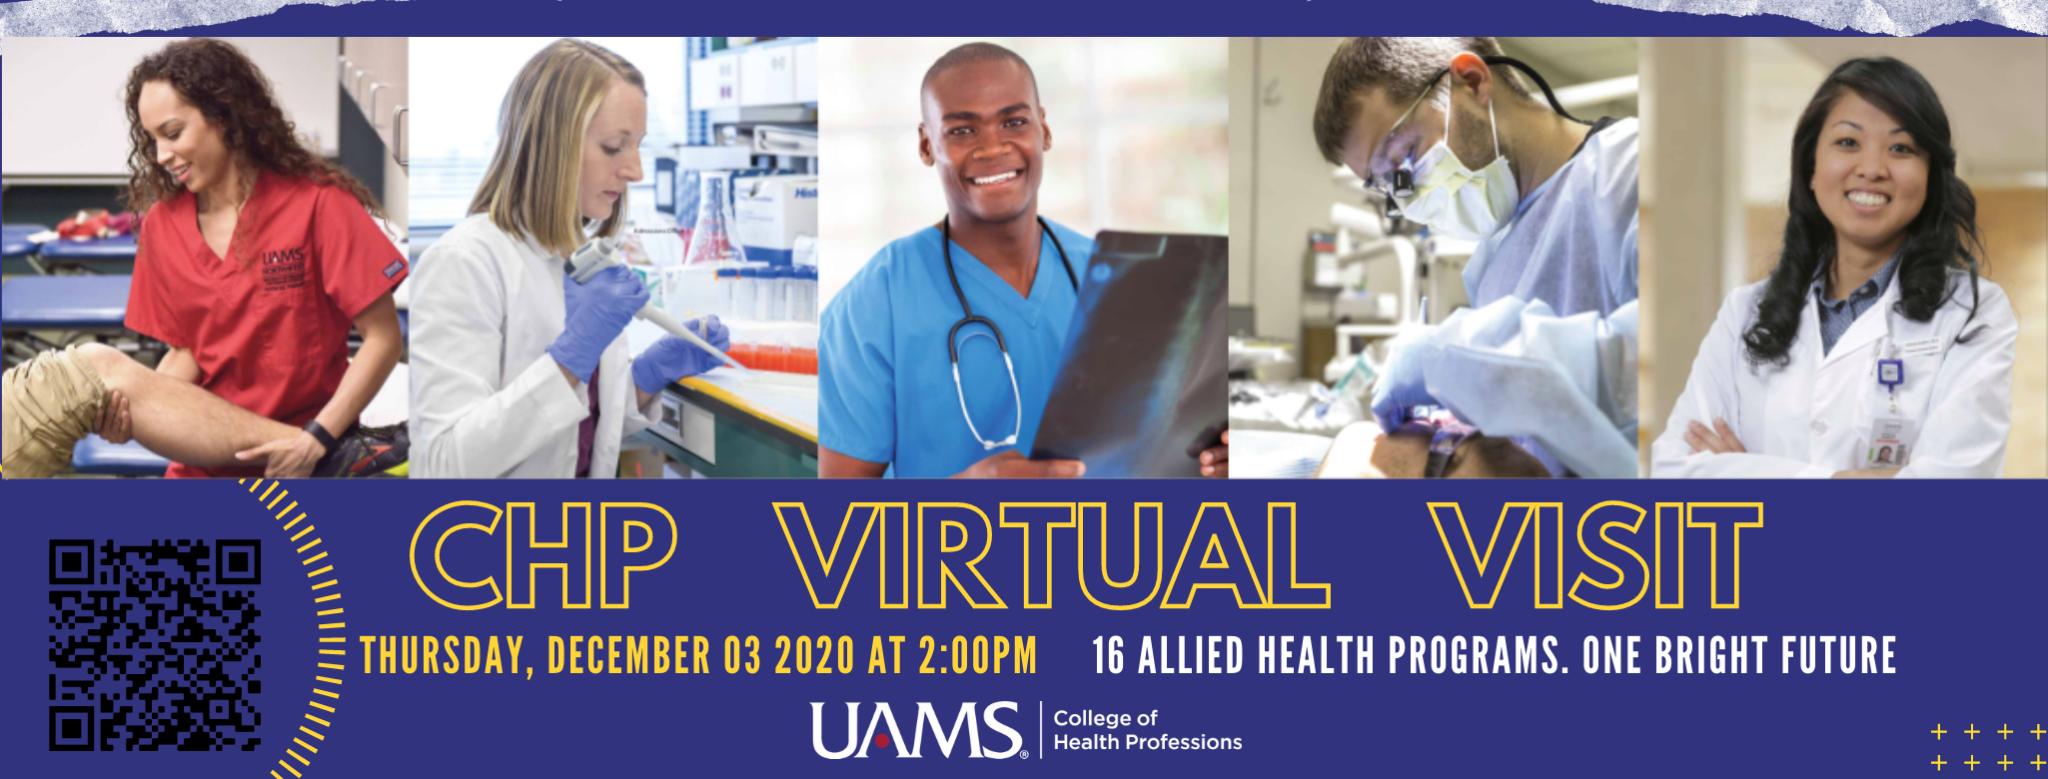 CHP Virtual Visit